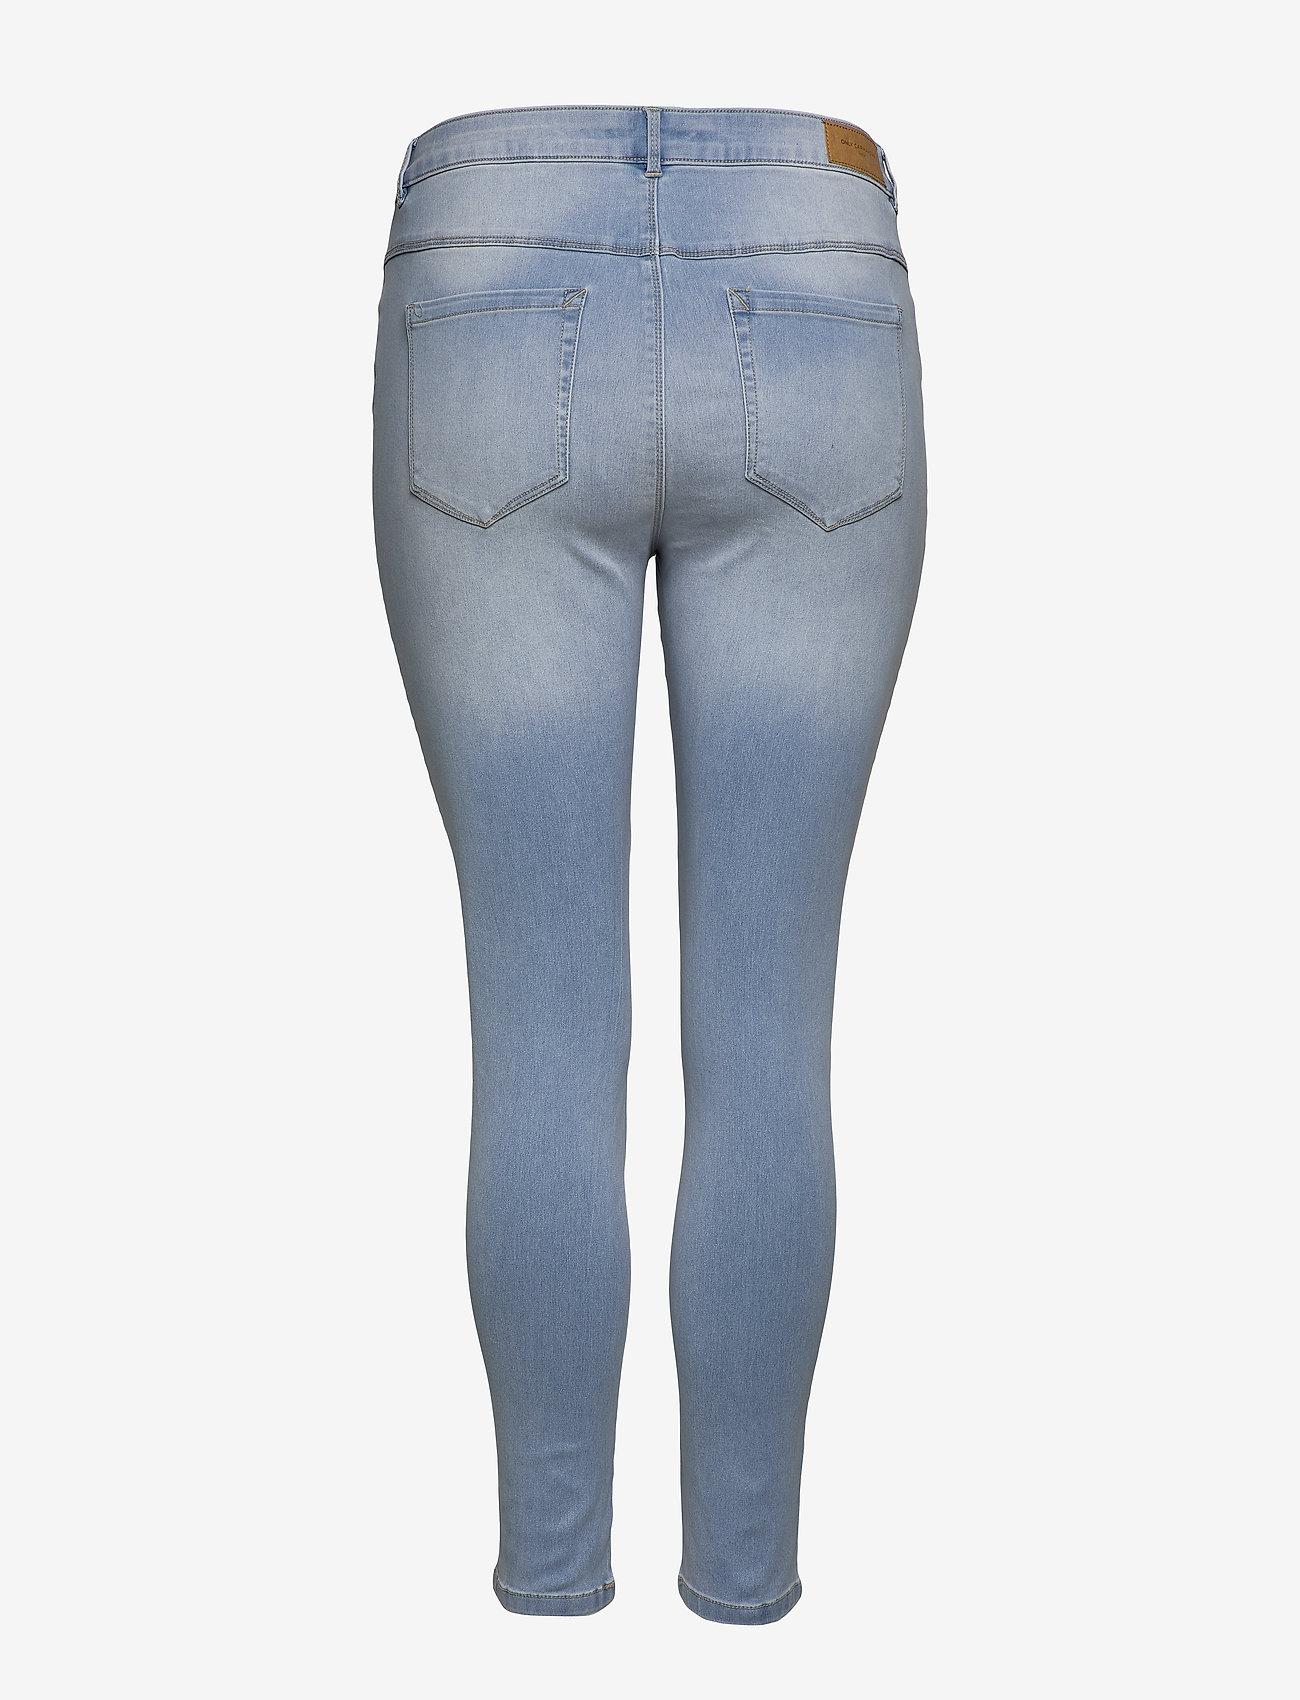 Caraugusta Hw Sk Jeans Bj13333 Lbd Noos (Light Blue Denim) (349 kr) - ONLY Carmakoma